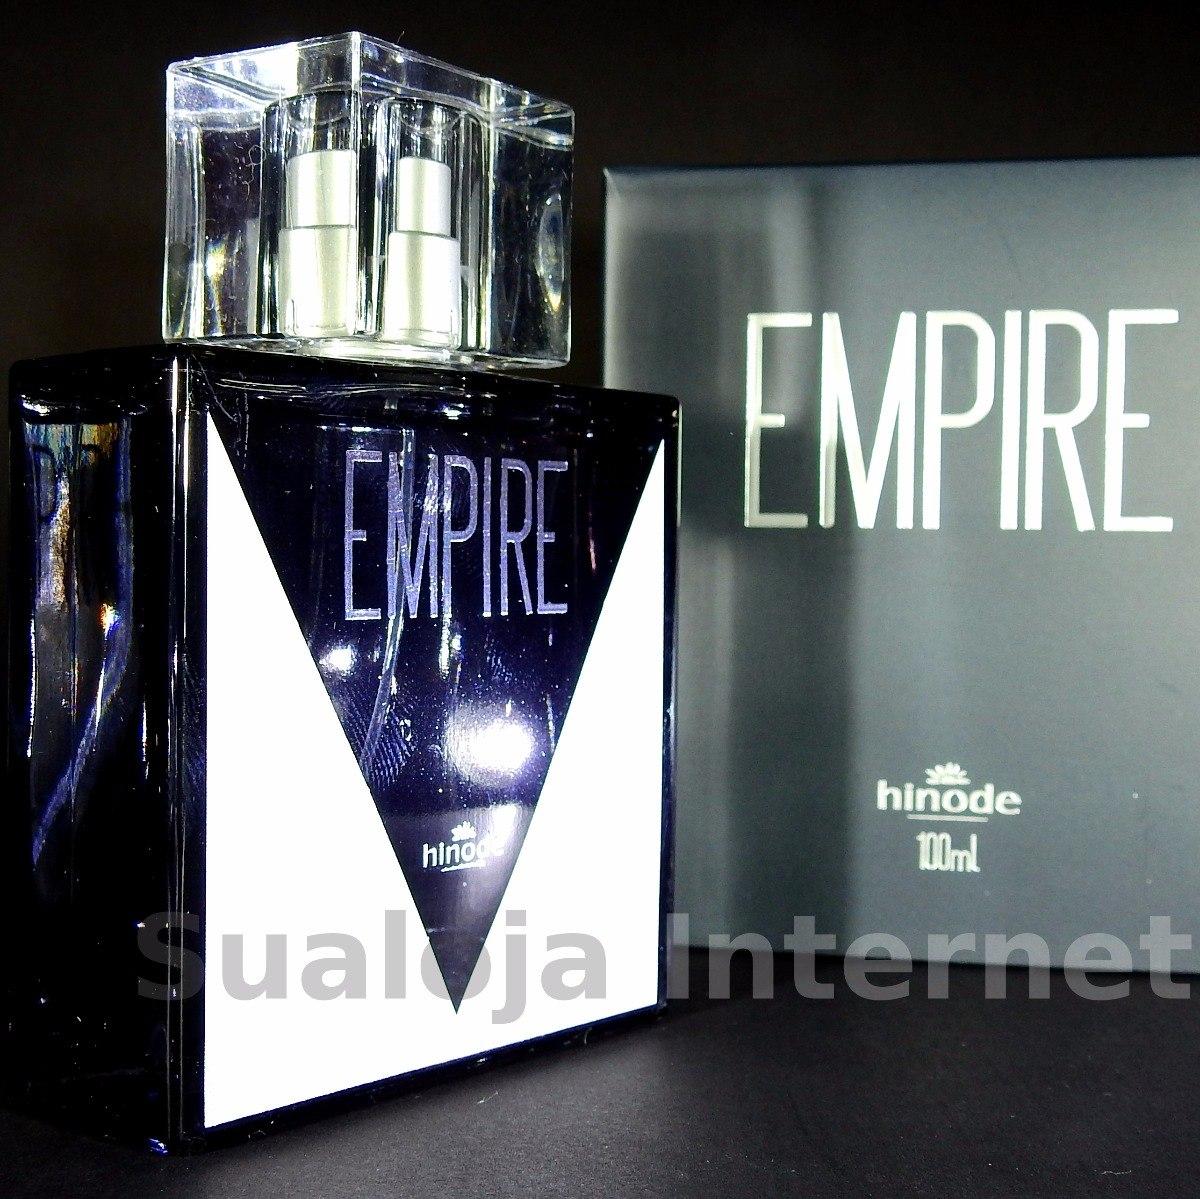 c6397f783 perfume empire tradicional hinode - original - lacrado 100ml. Carregando  zoom.